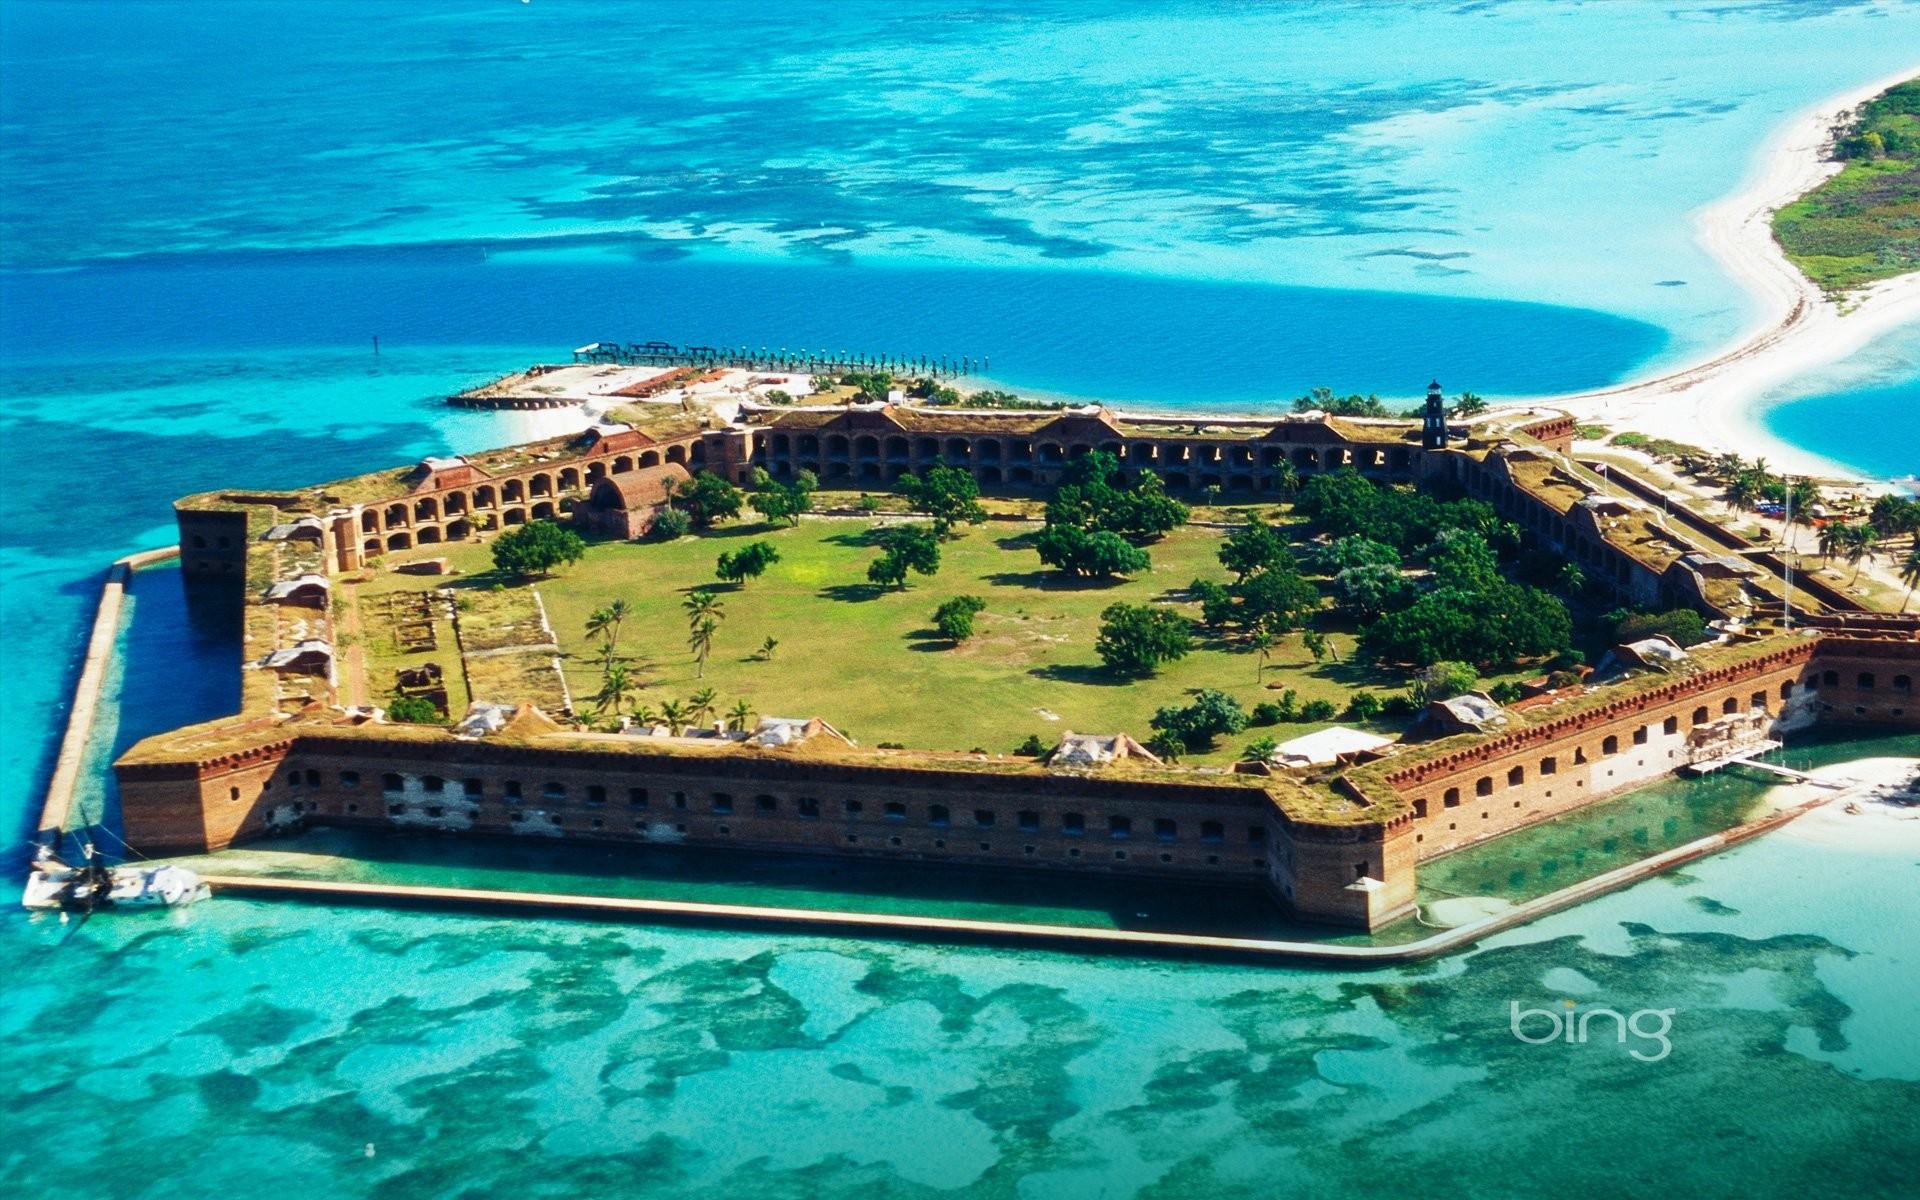 Sea fortress fort jefferson bing wallpaper background 1920x1200